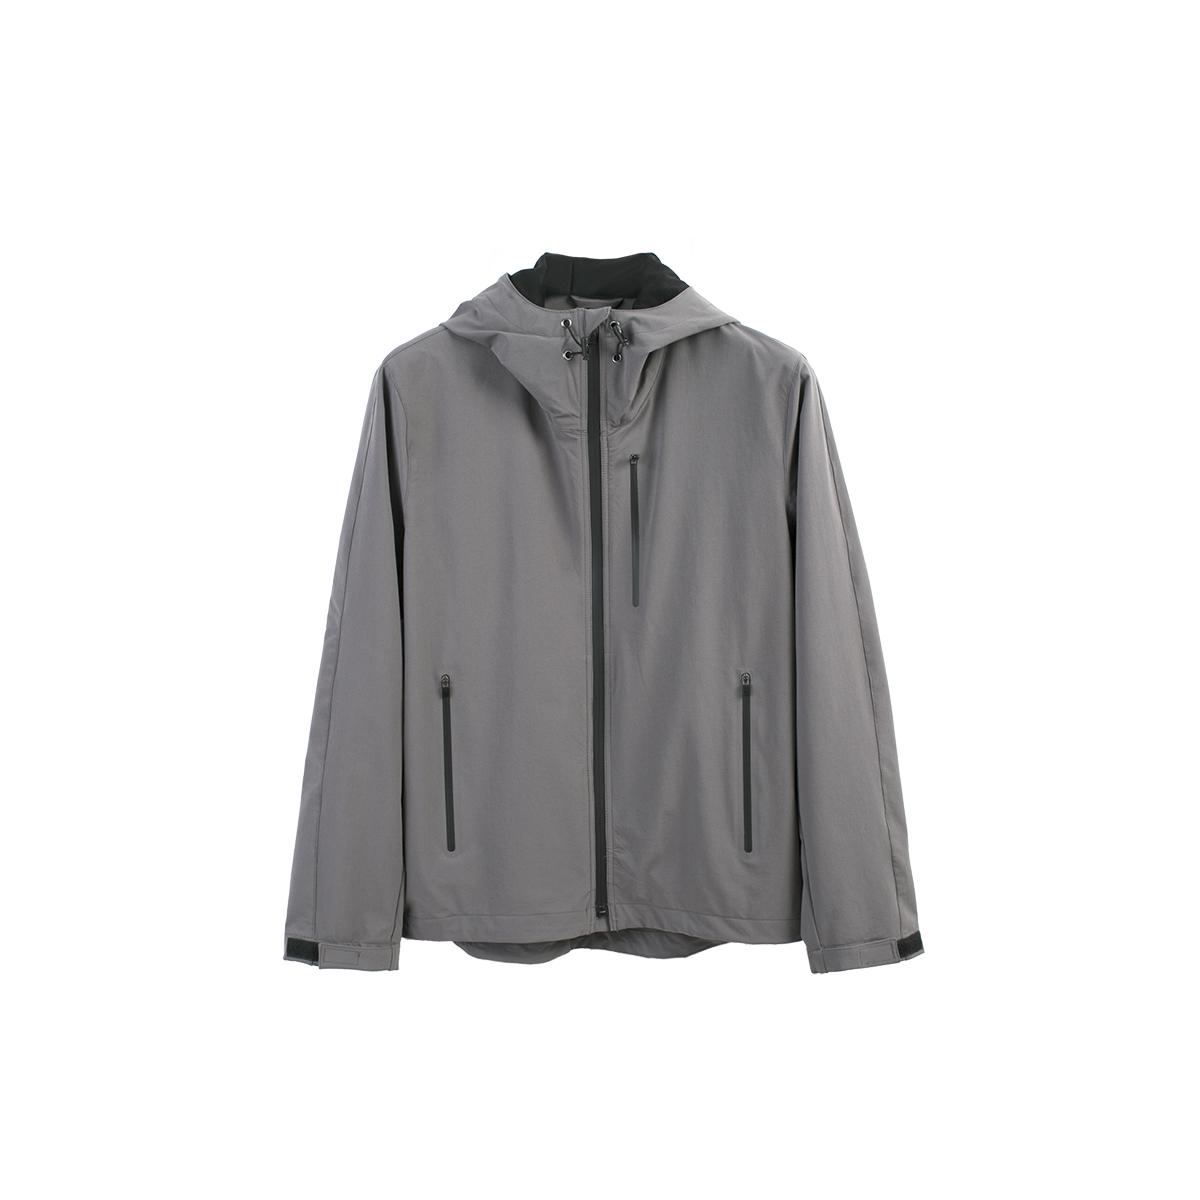 【Nans】 свет группа качества крышка ветролом одежда / LIGHT FULL-ZIP PARKA - NS2A03